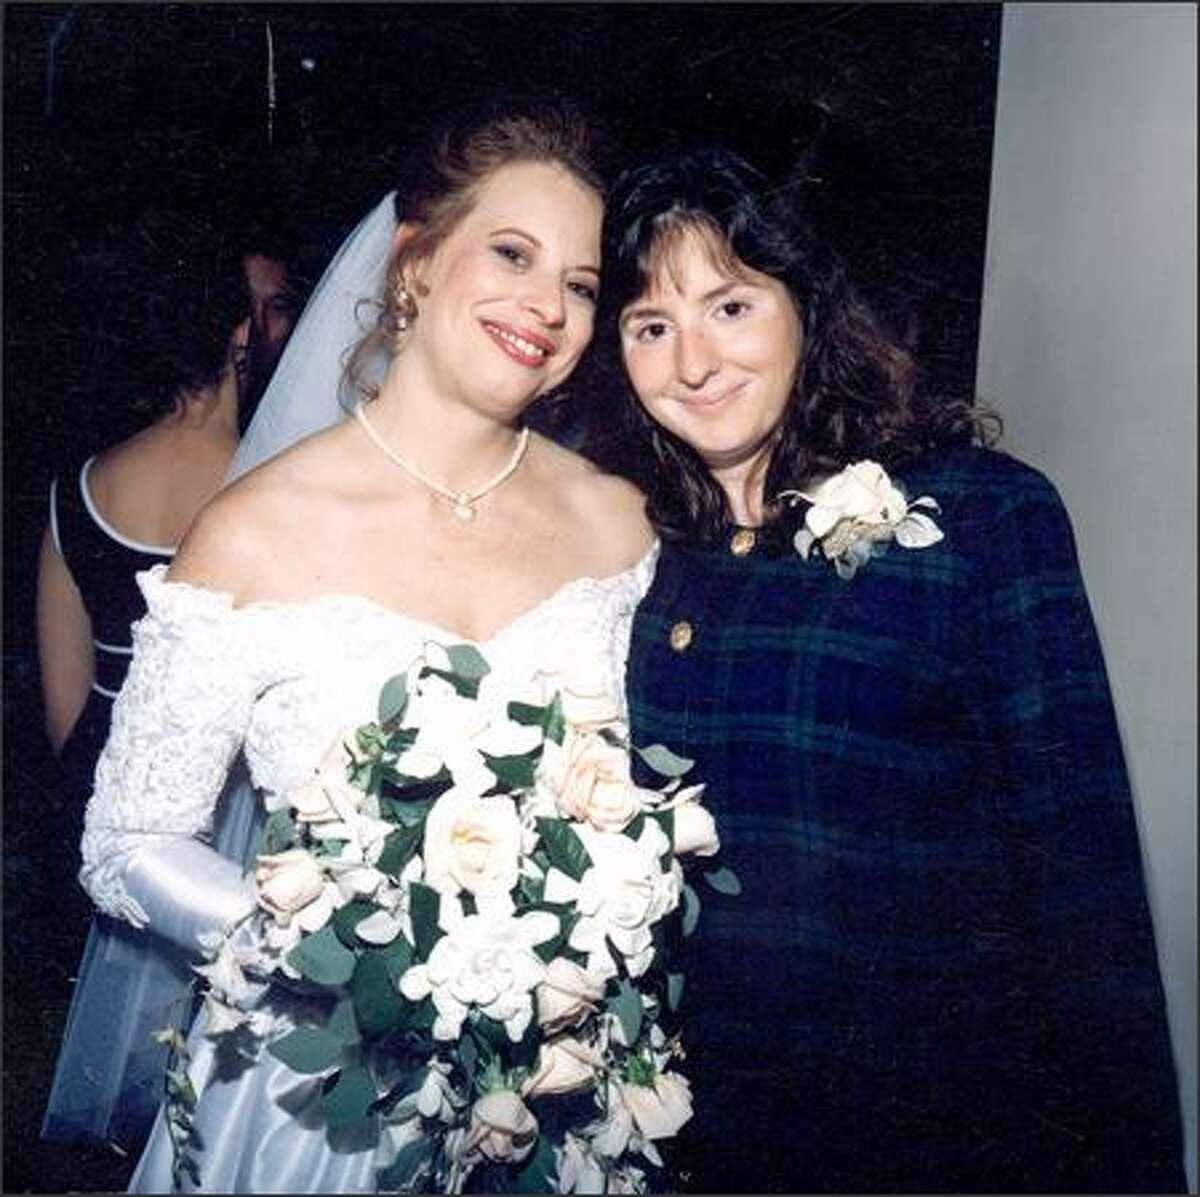 Christine Turner and younger sister Francine Hunter at Christine's wedding in 1995.